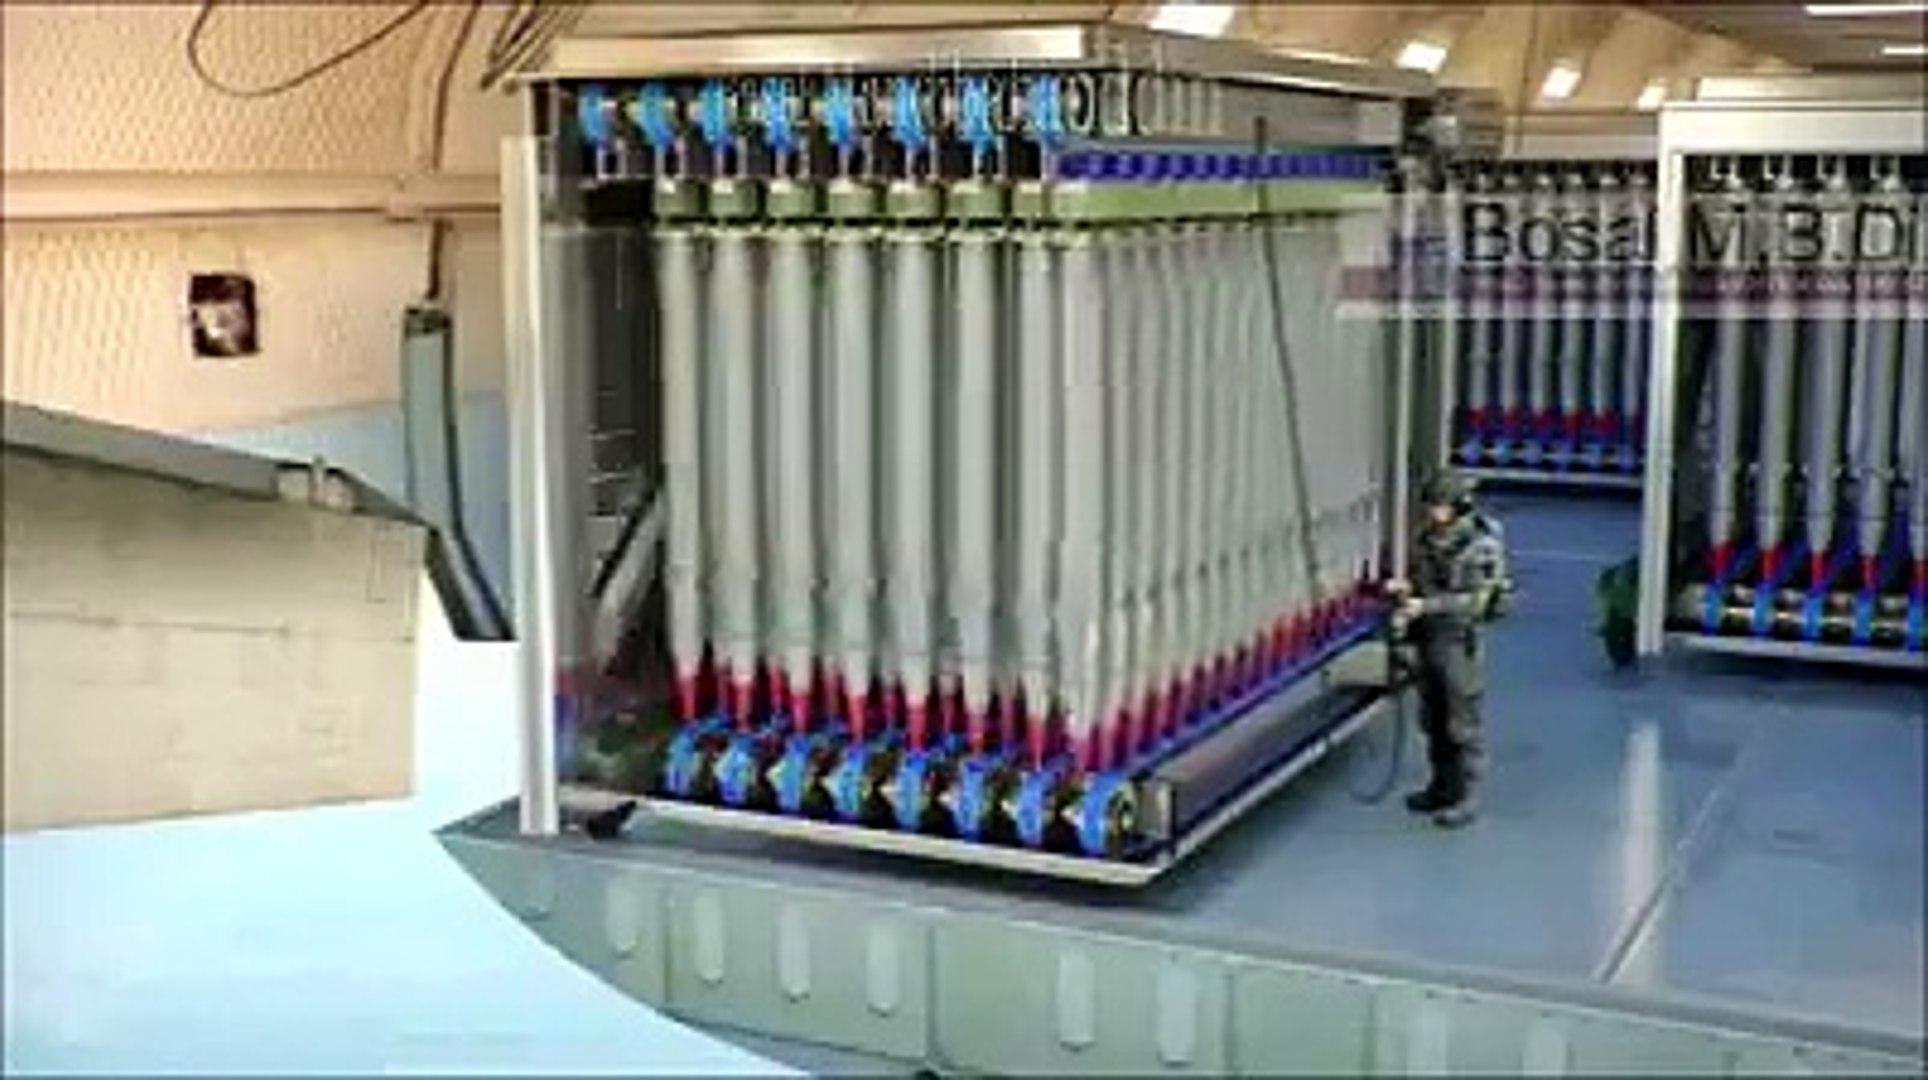 spy jasoos tanks latest technology enemy fails